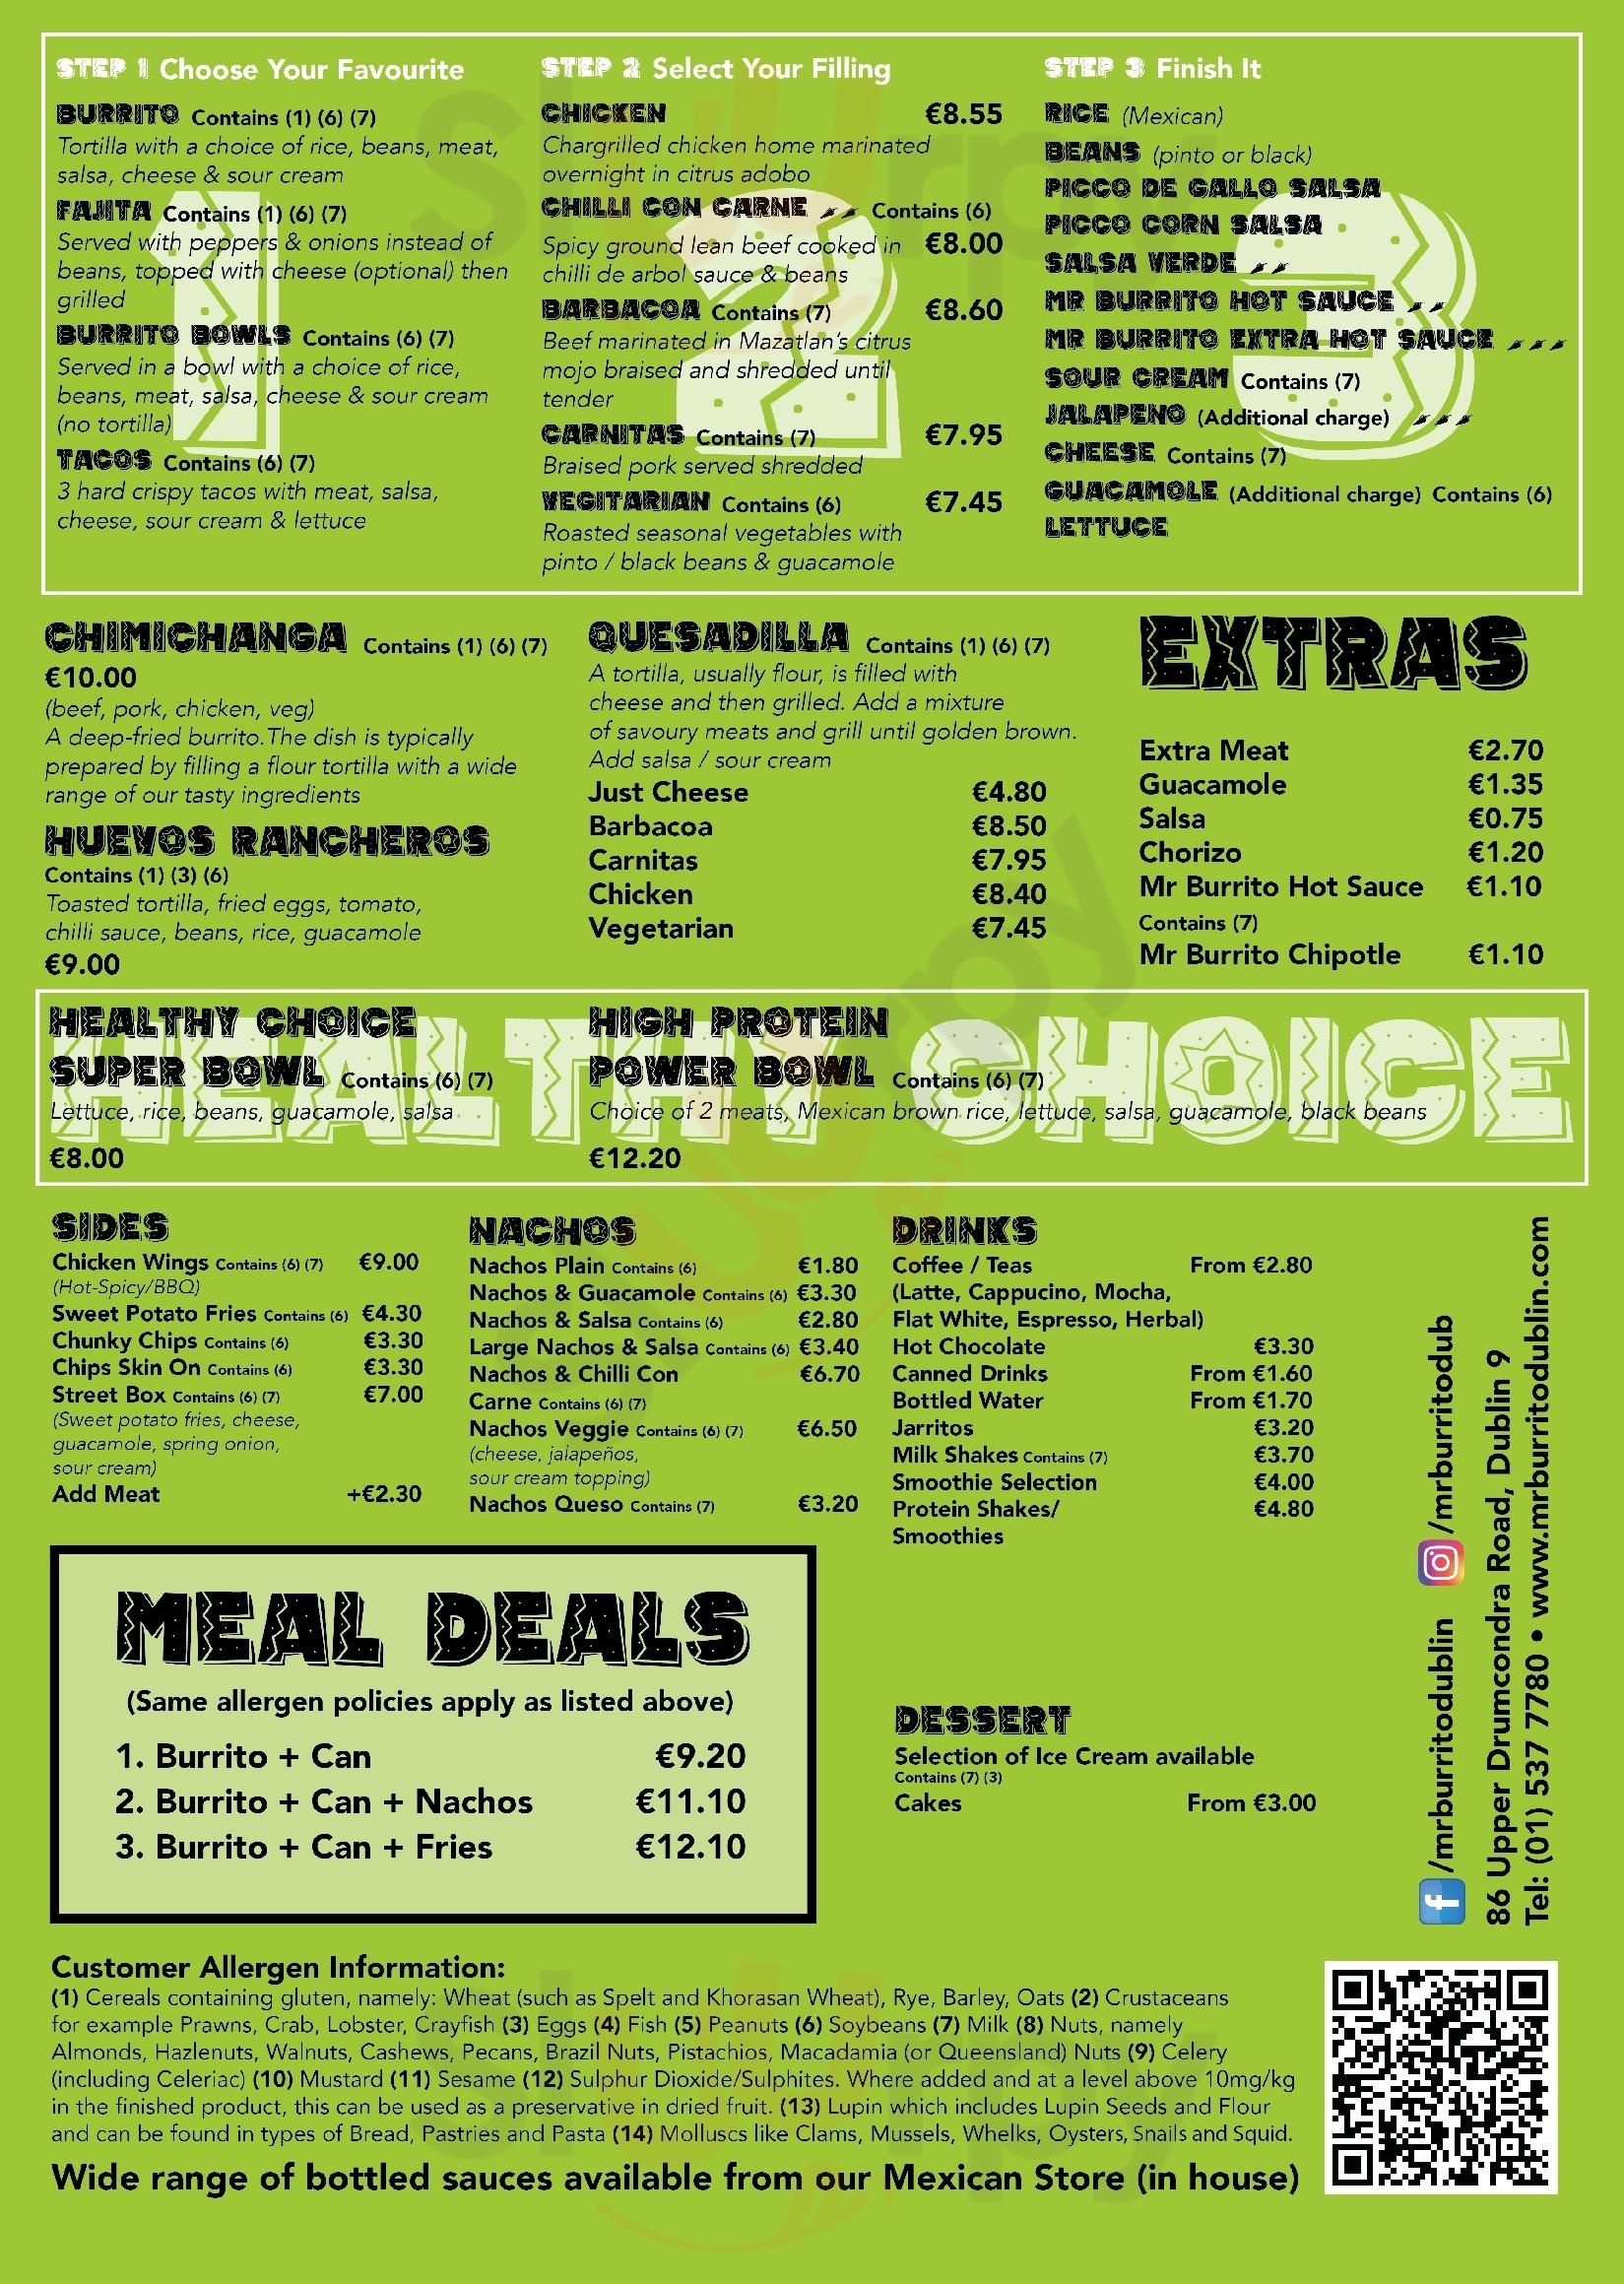 Mr Burrito Dublin Menu - 1